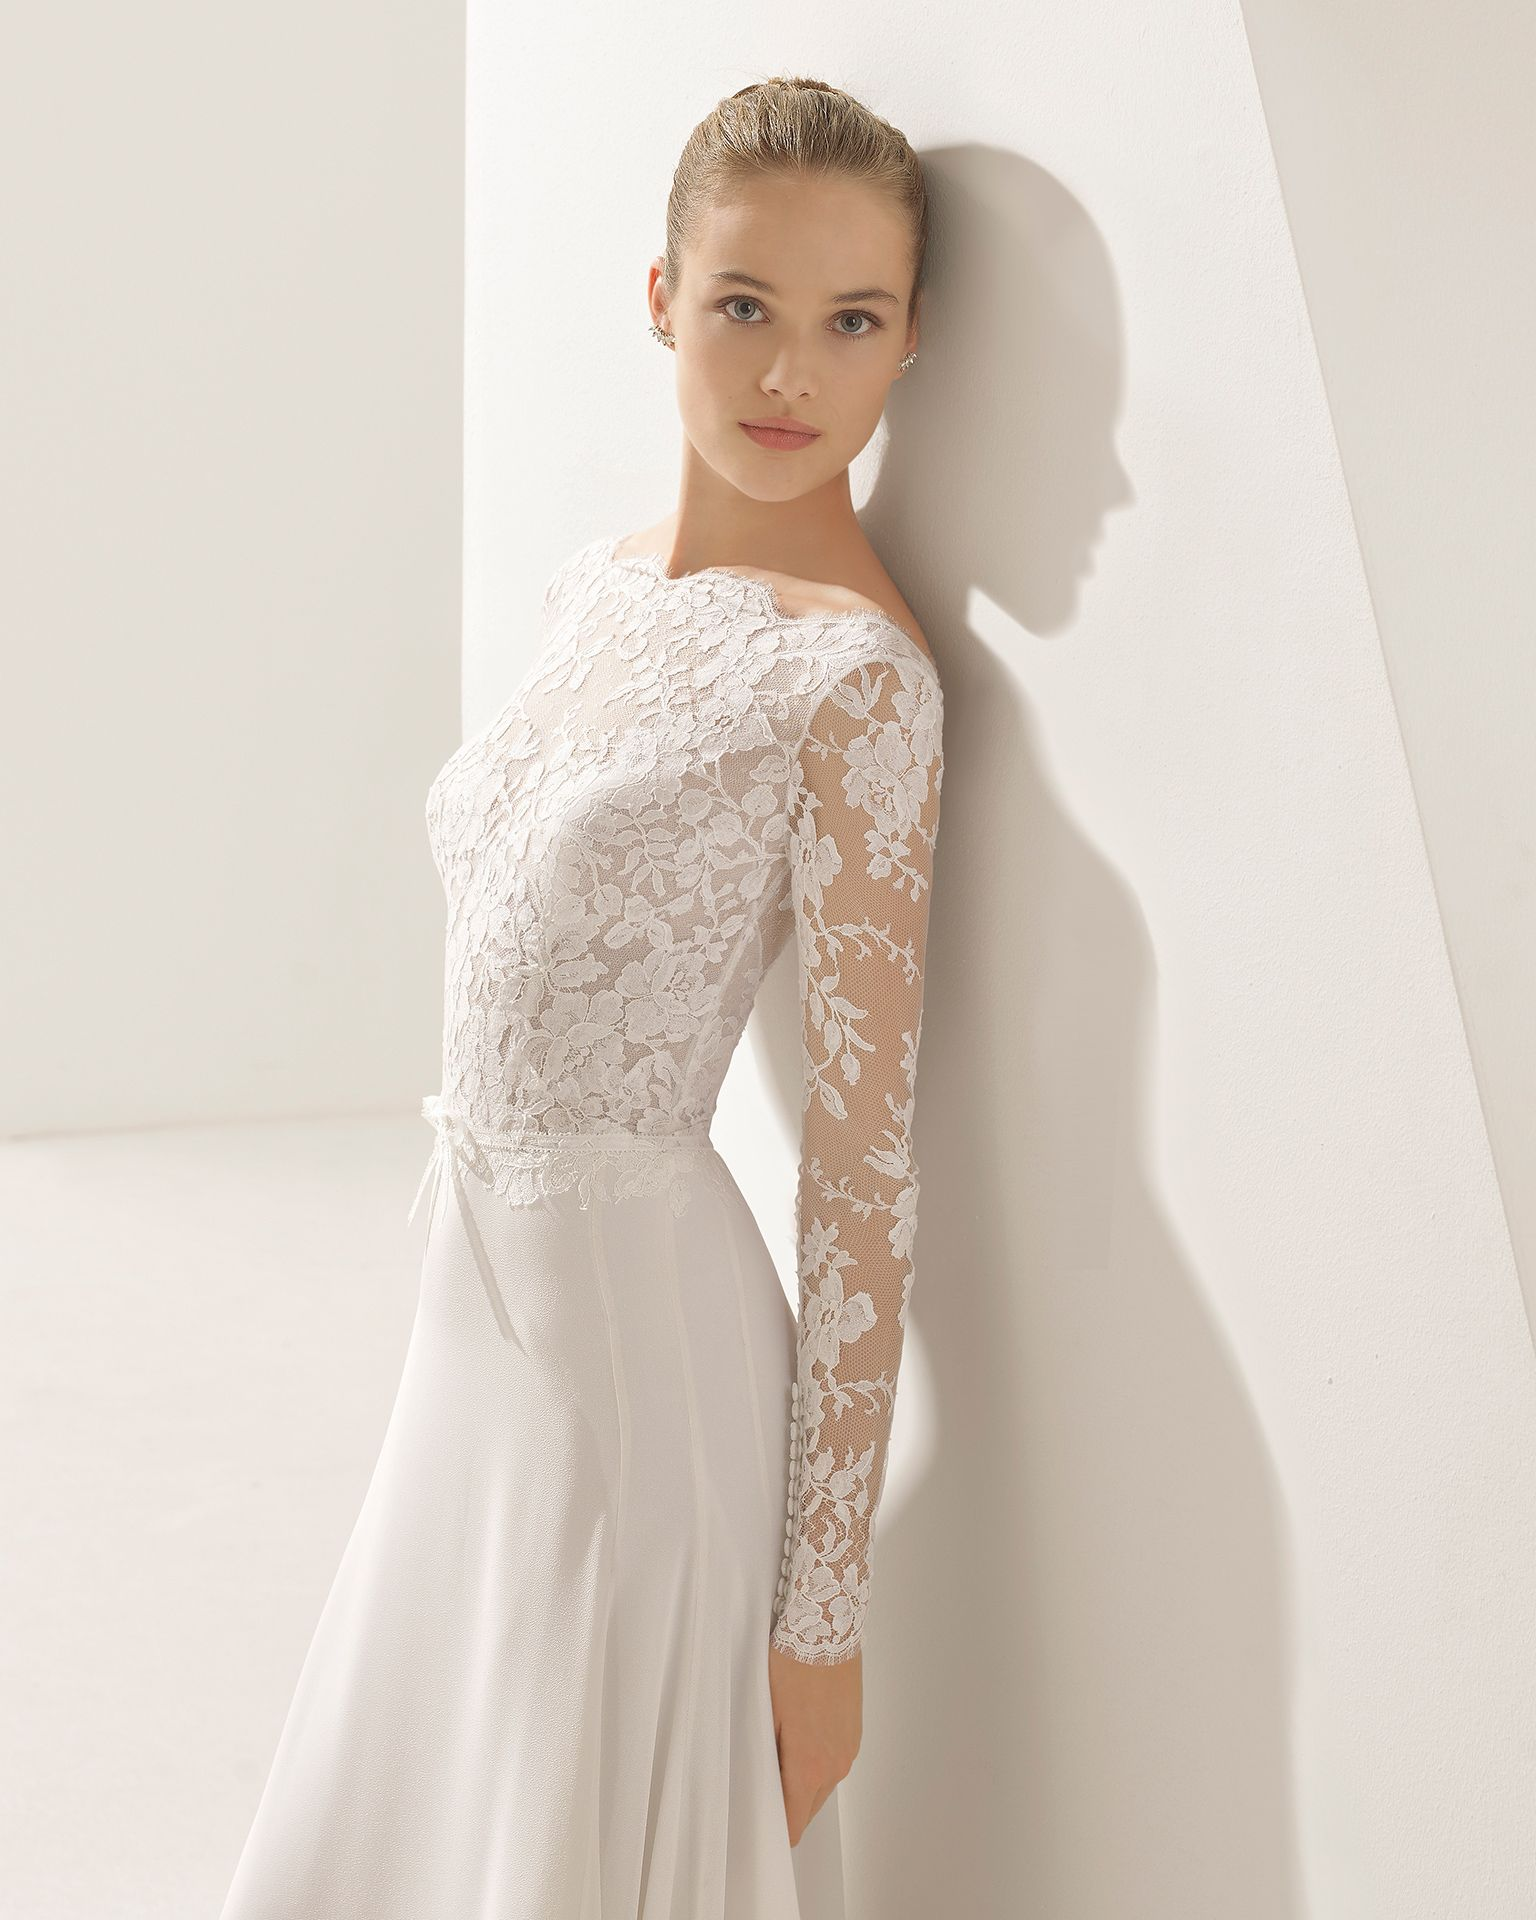 PASCAL - Hochzeit 2018. Kollektion Rosa Clará Couture | Rosa clará ...